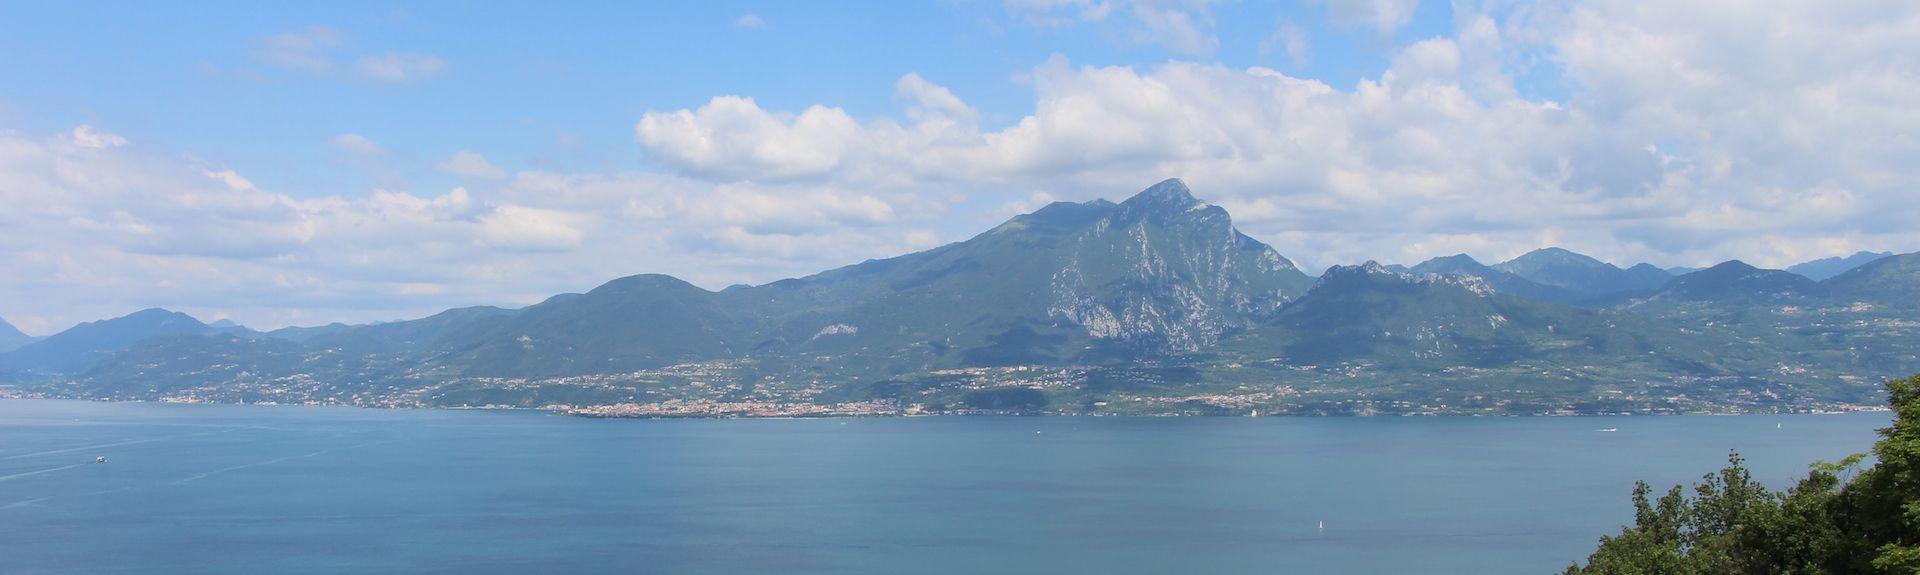 Pescantina, Veneto, Italië